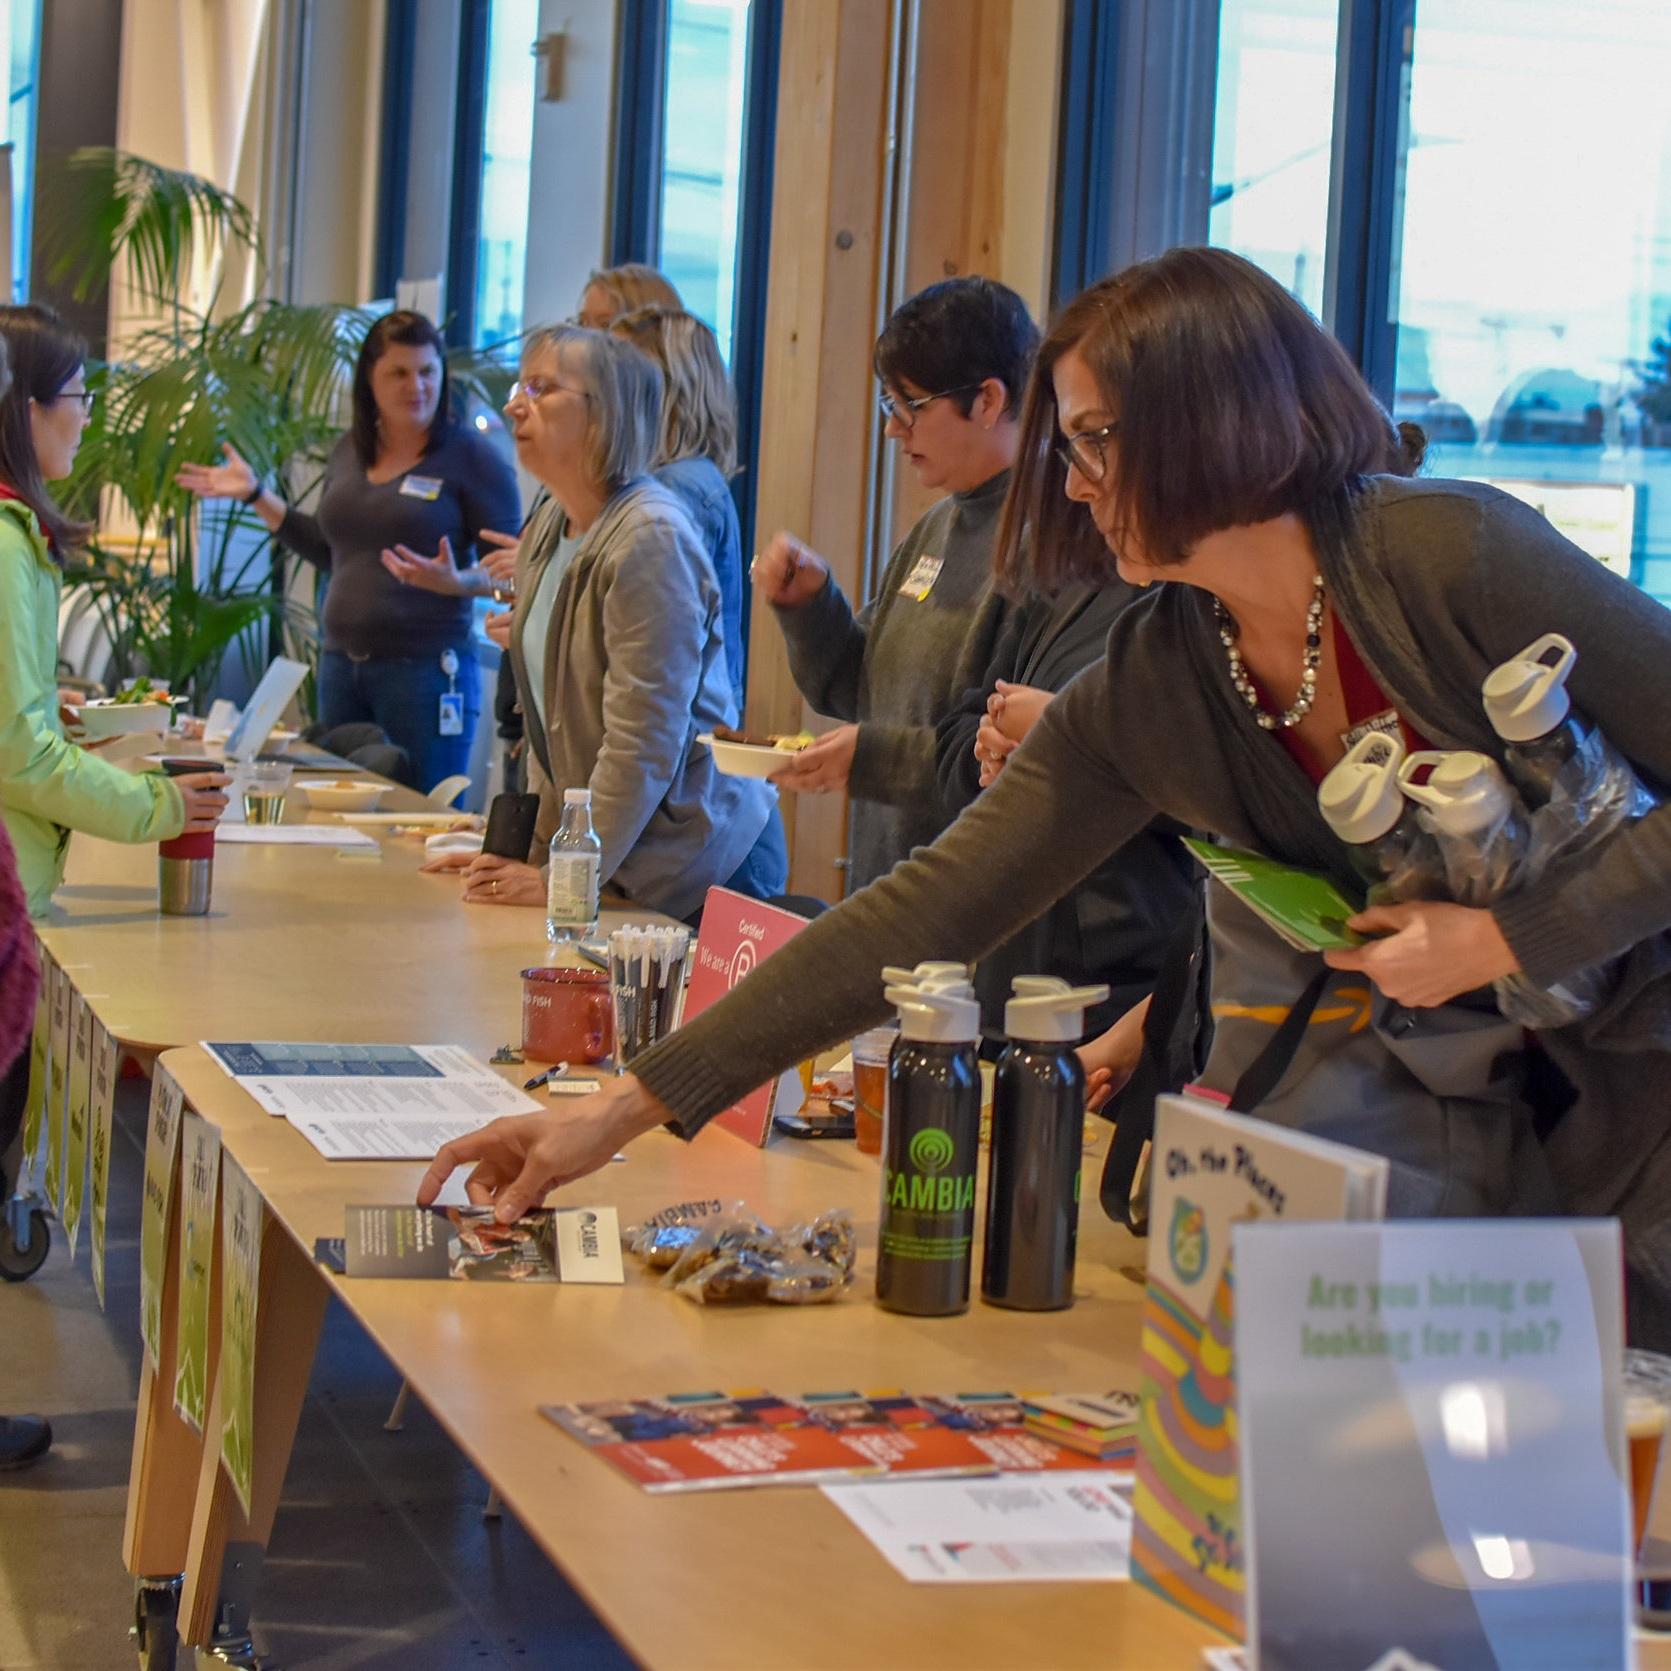 sponsor-jobs-table-at-event.jpg